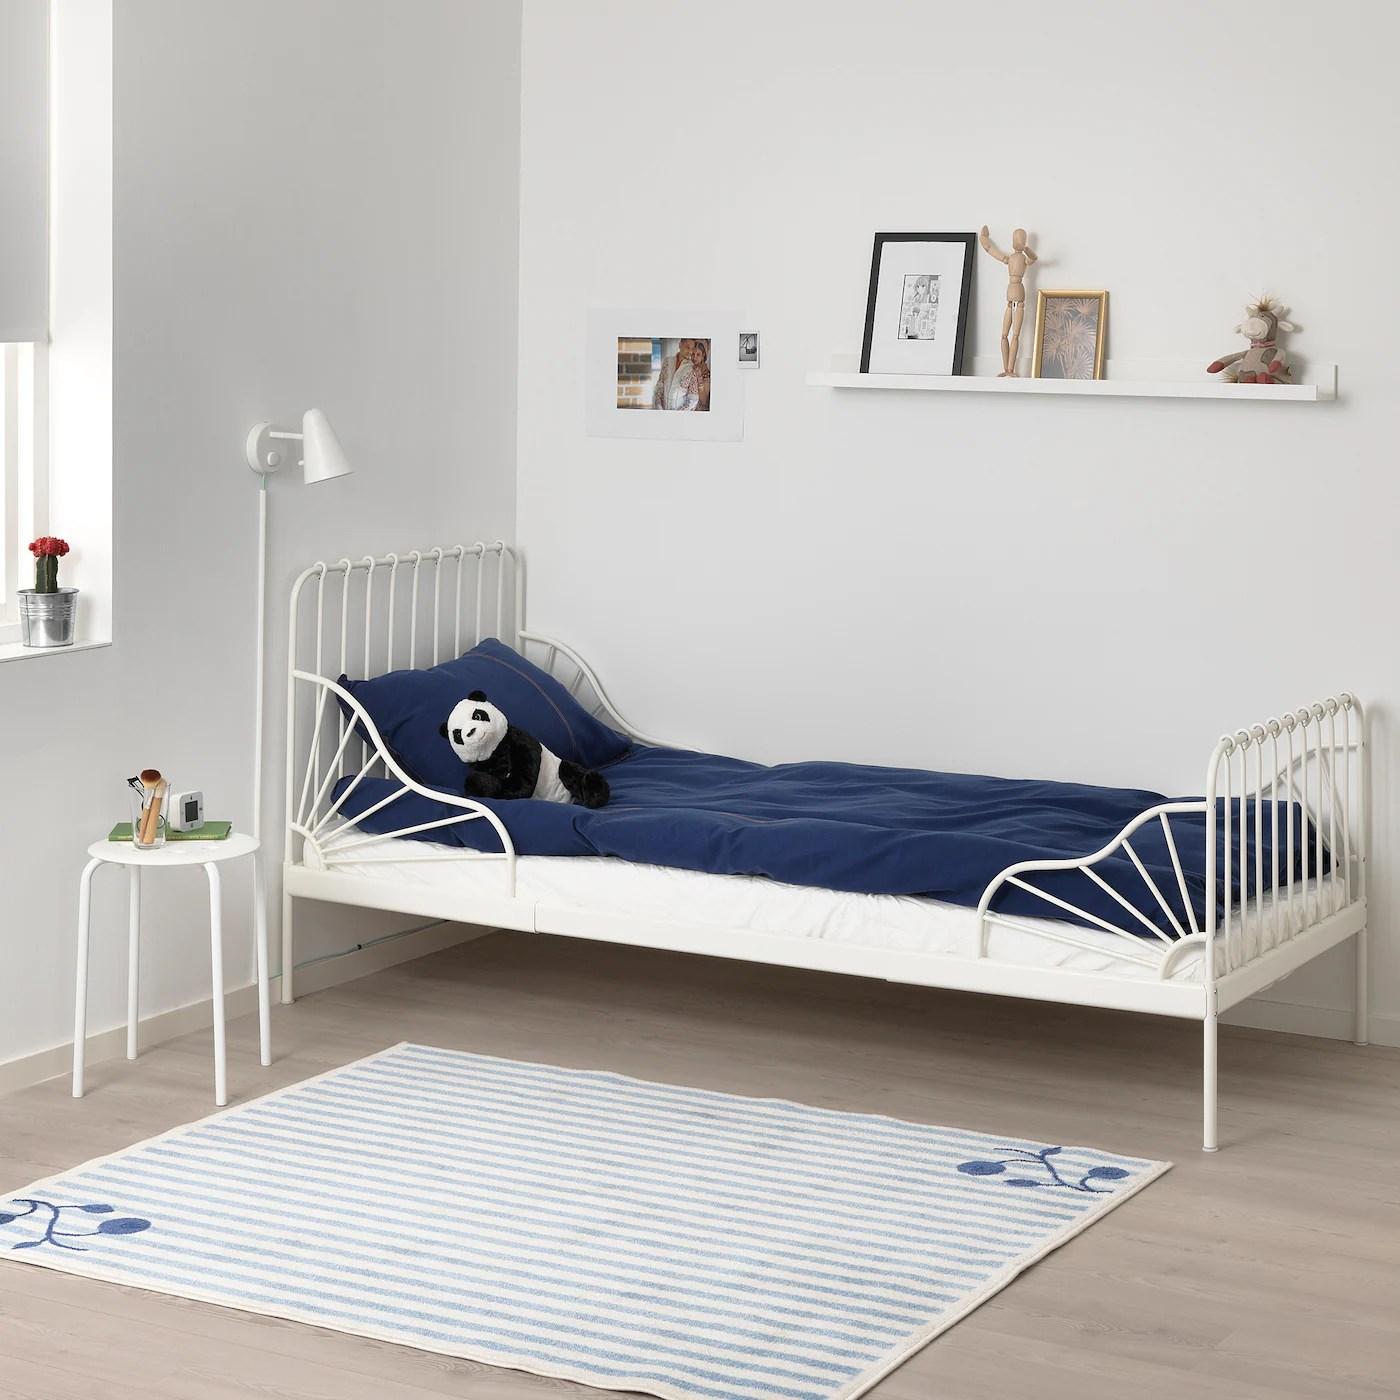 Minnen Cadre De Lit Extensible Blanc 80x200 Cm Ikea